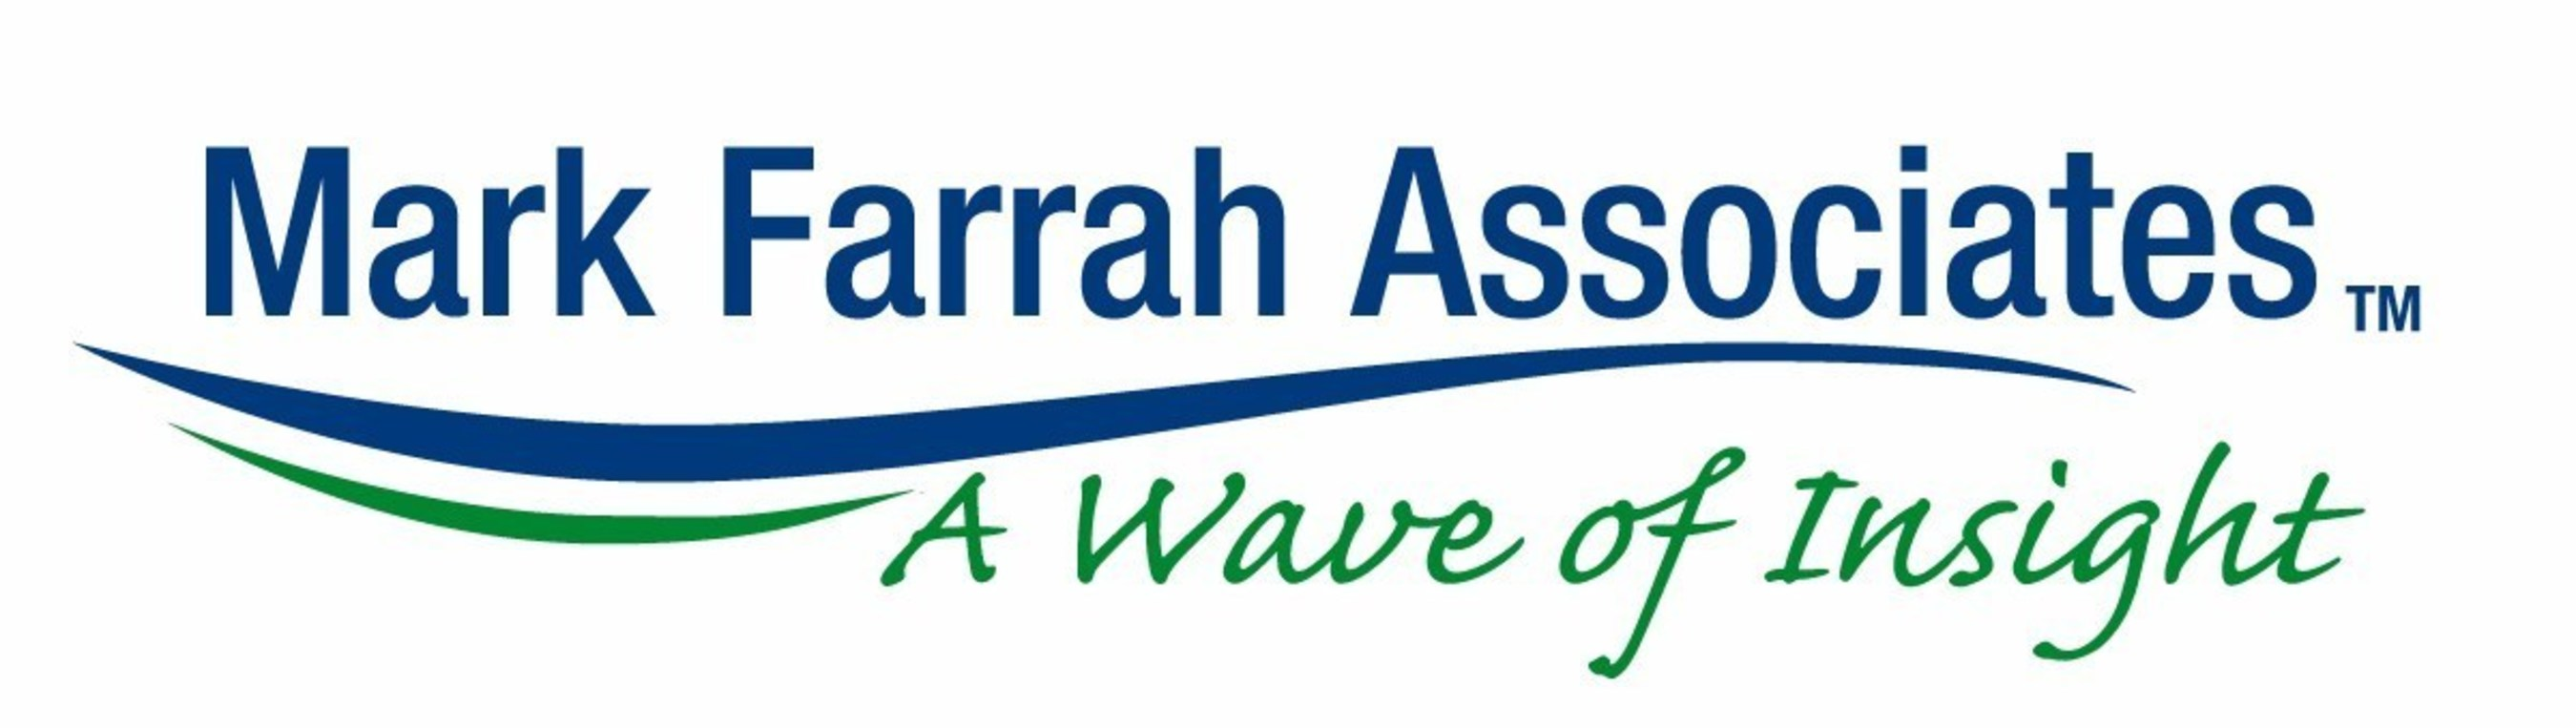 Mark Farrah Associates (PRNewsFoto/Mark Farrah Associates)